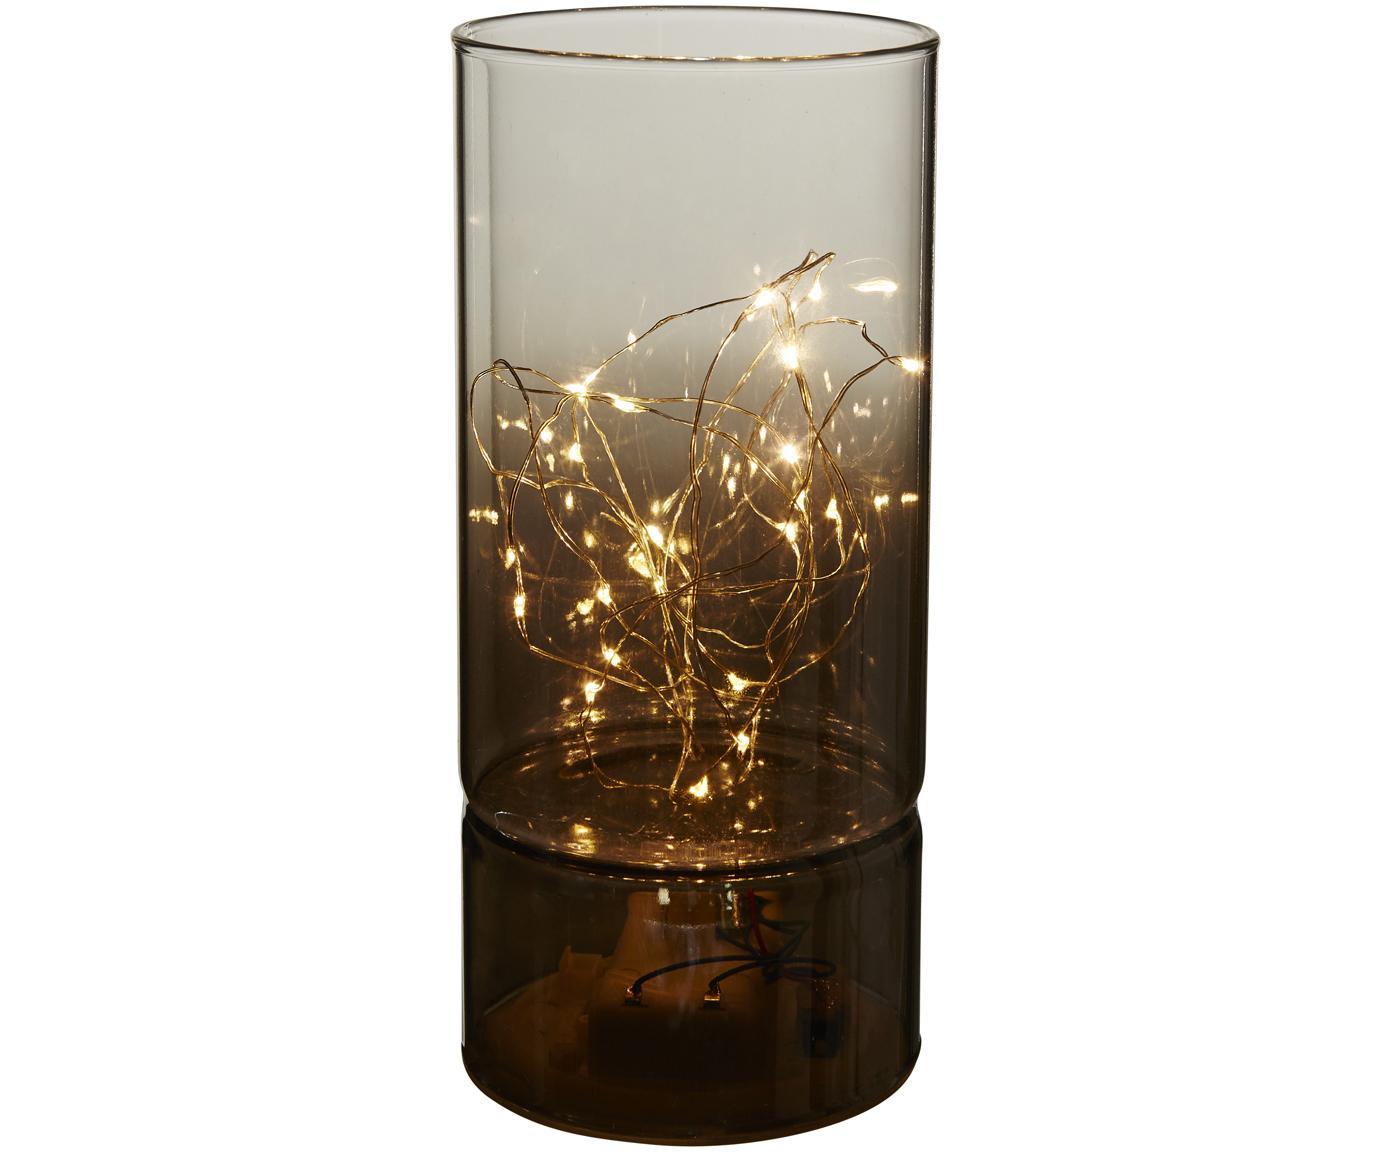 Lampada da tavolo Mirror Tube a LED a batteria, Lampada: vetro, Grigio, Ø 9 x Alt. 20 cm